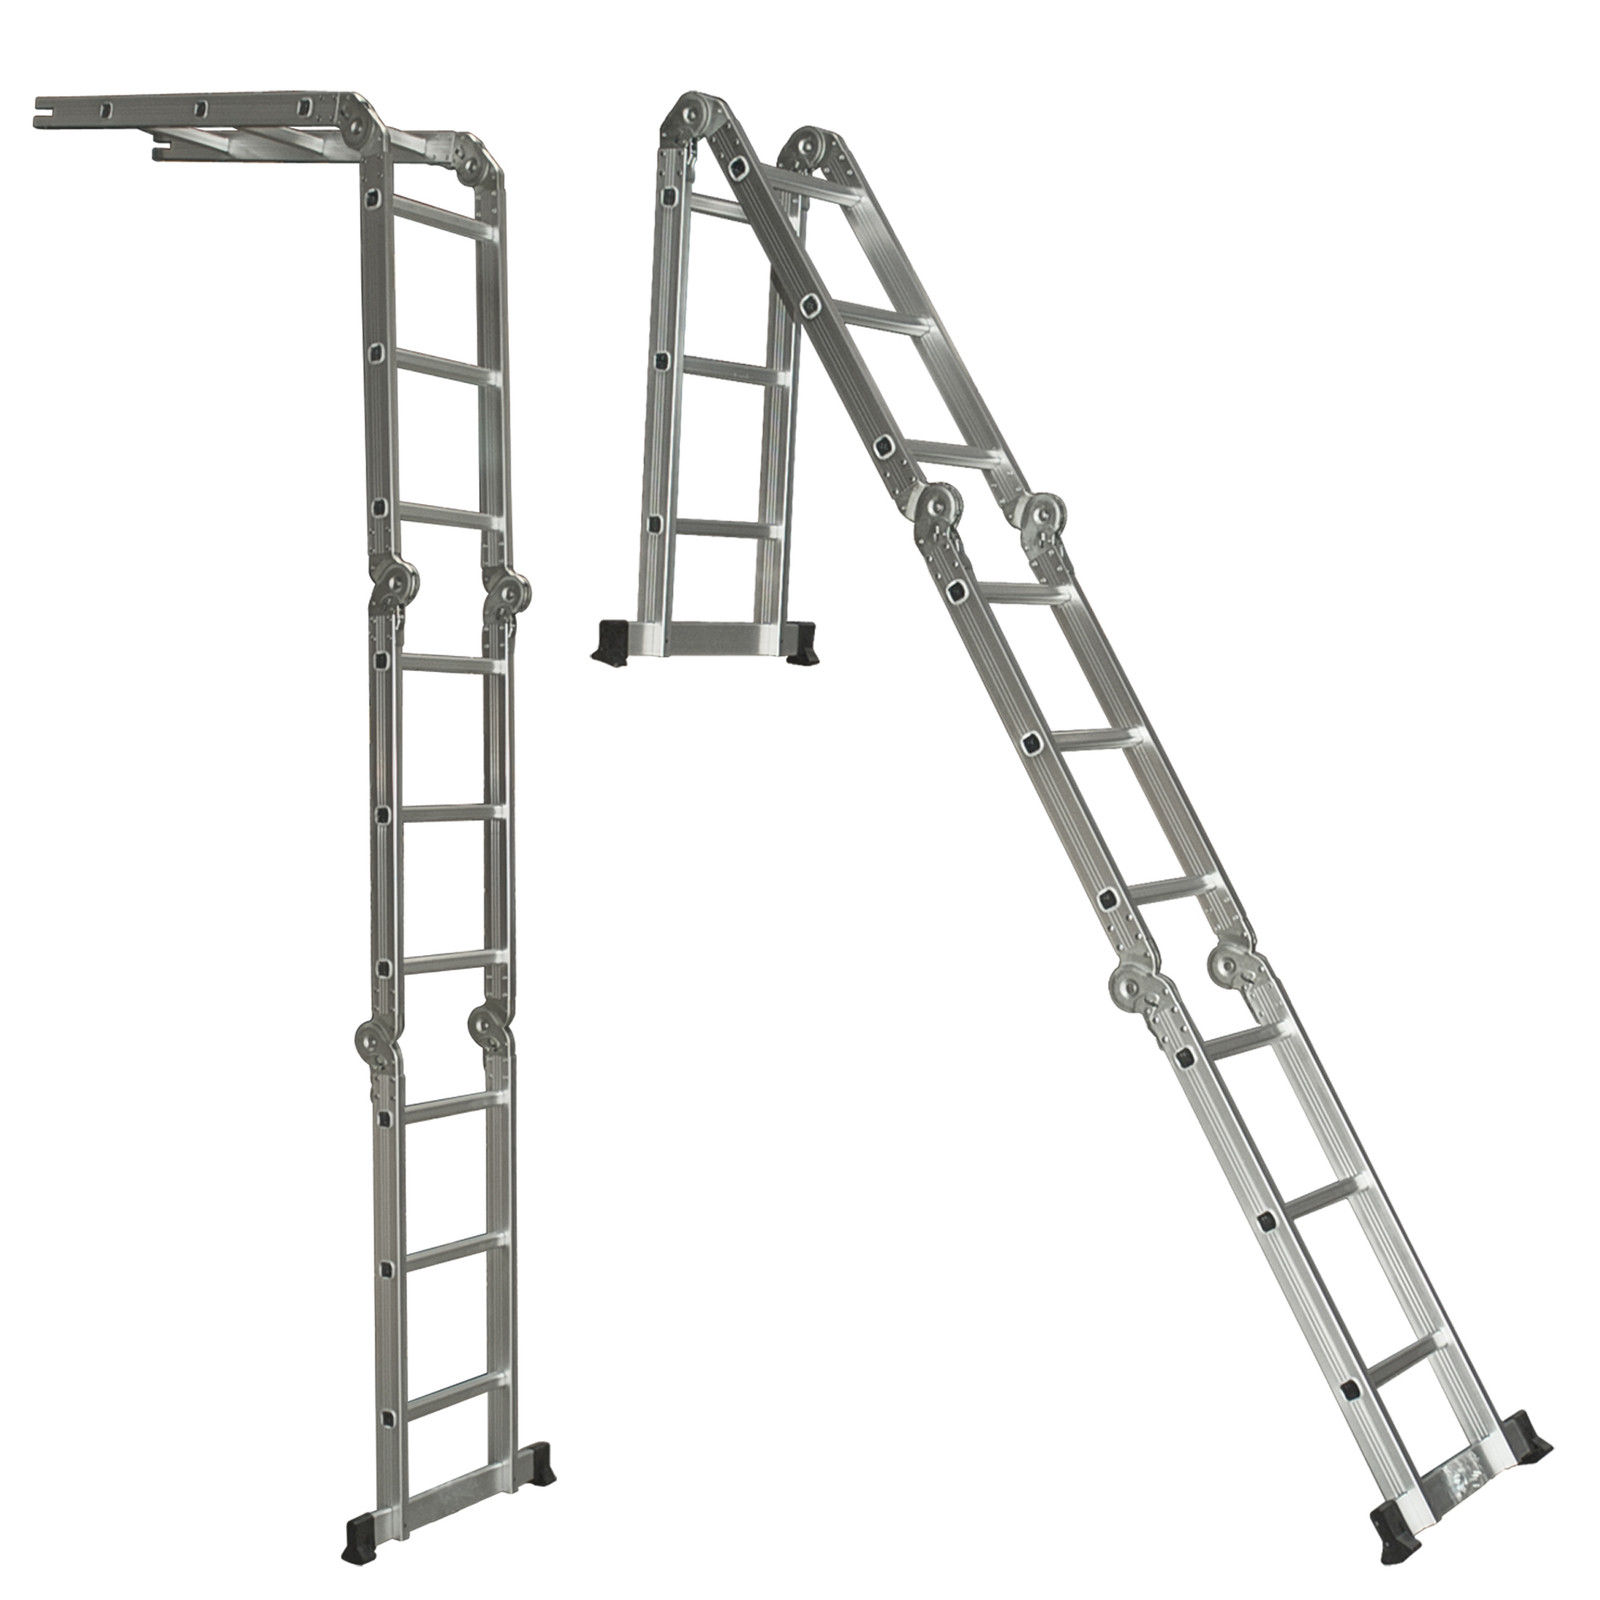 Ladder 12 Foot Multi Purpose Position Aluminum Folding